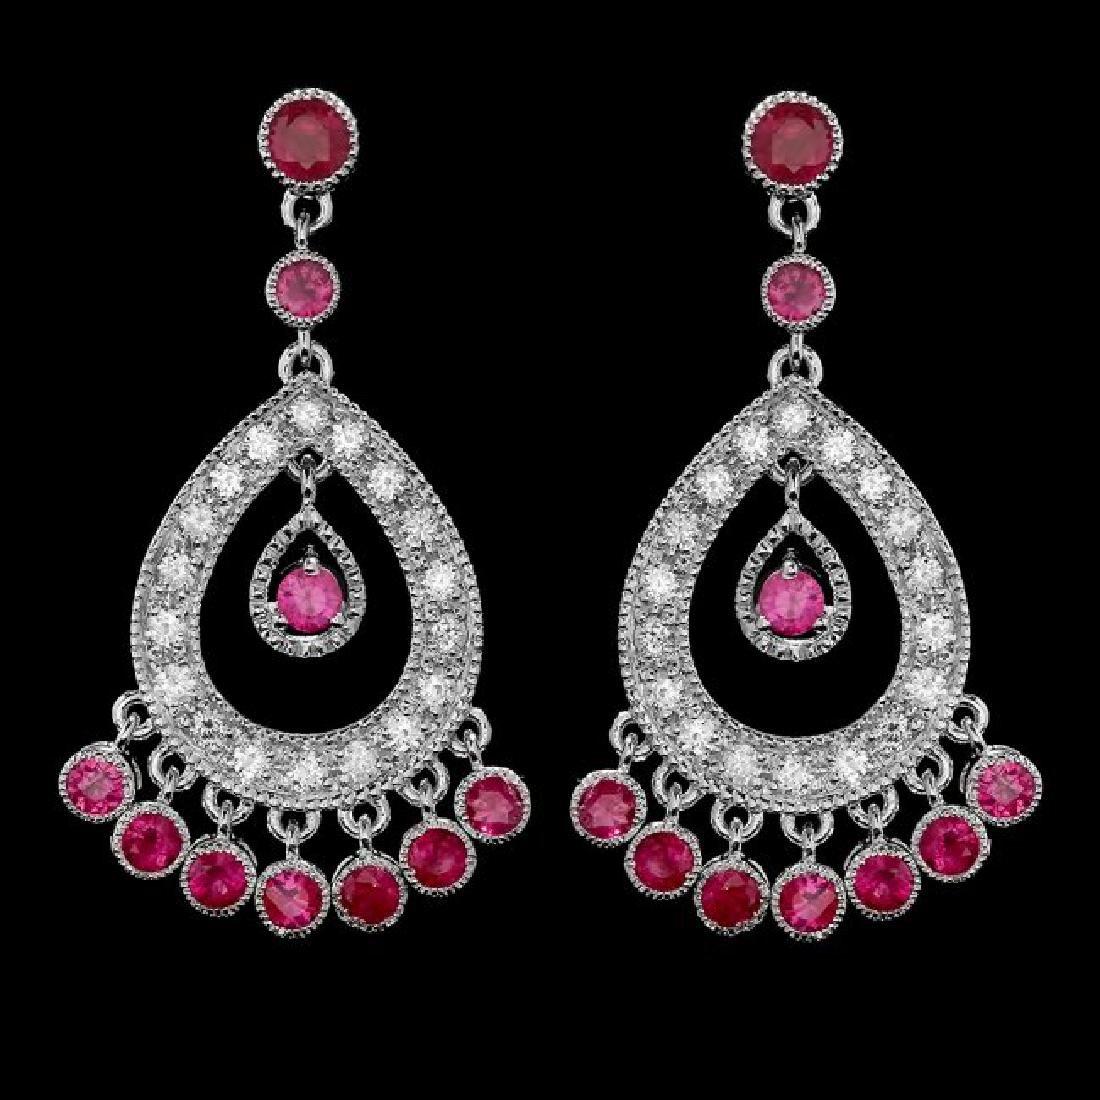 14k Gold 3.00ct Ruby 1.30ct Diamond Earrings